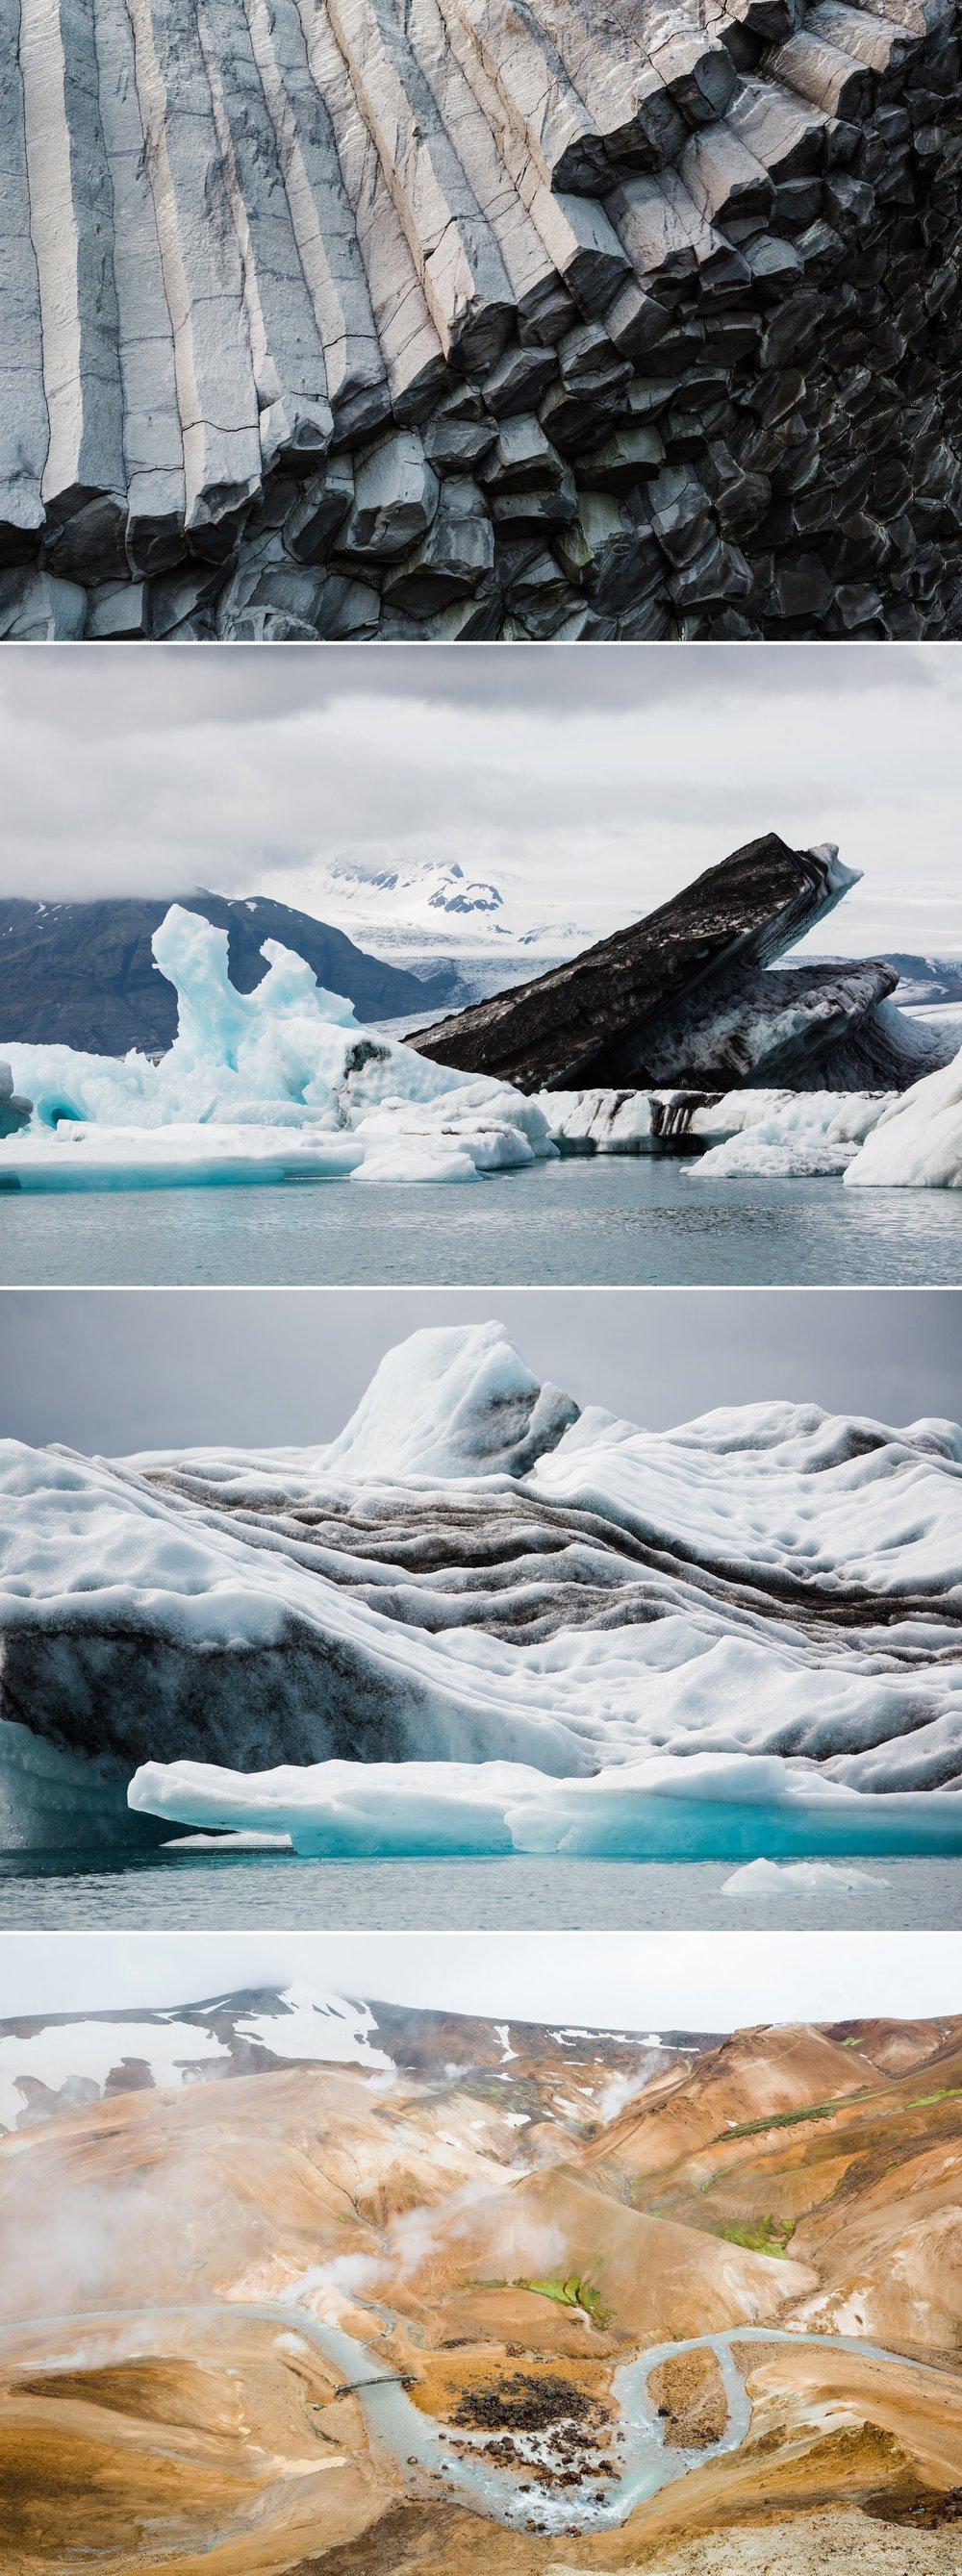 18-iceland-land-fire-ice.jpg